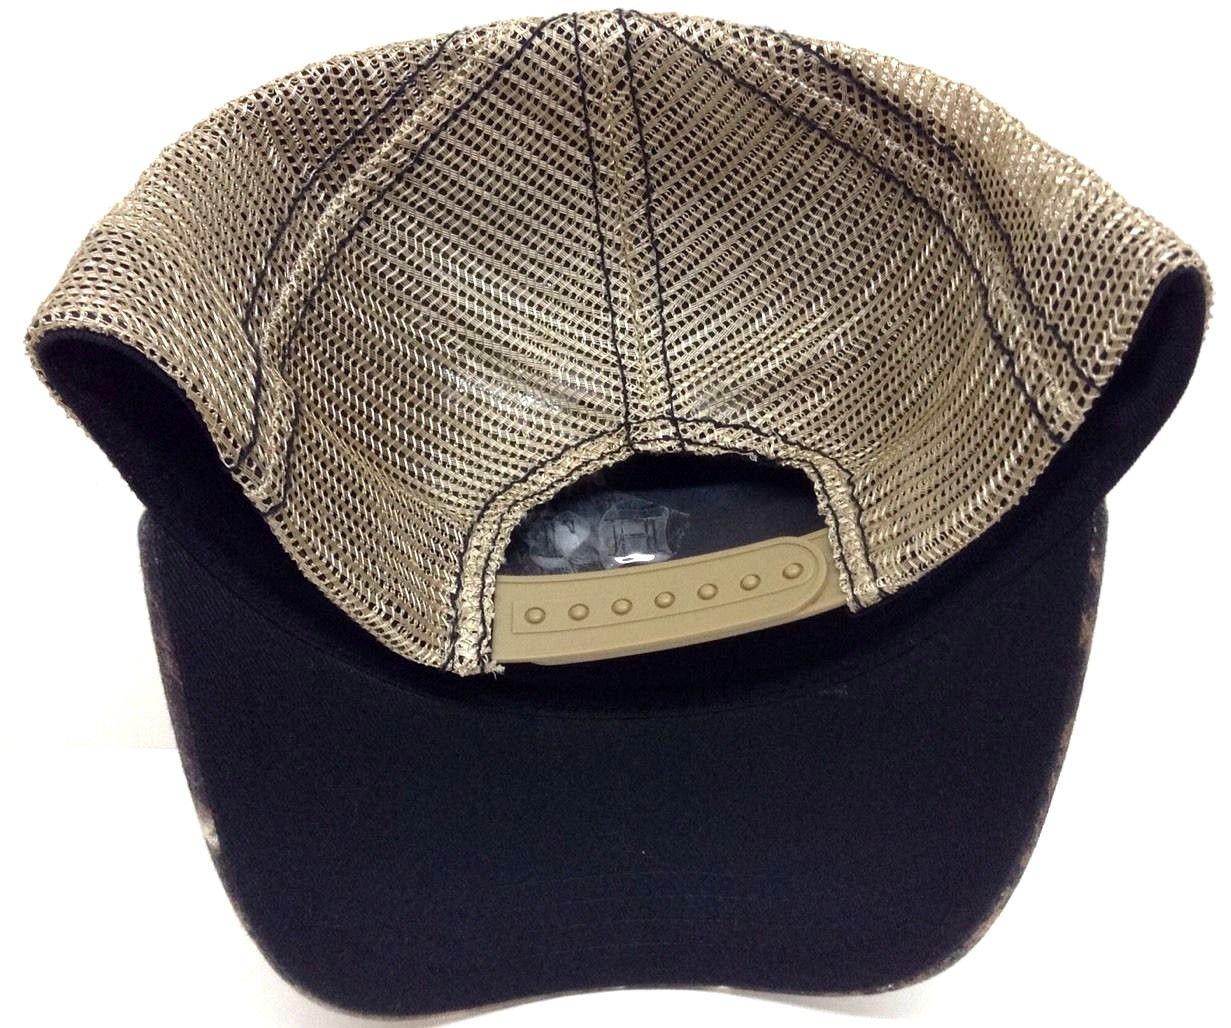 3cd06ed6 Amazon.com : Chevy Mesh Trucker Mossy Oak Camo Snapback Hat : Sports Fan Baseball  Caps : Sports & Outdoors